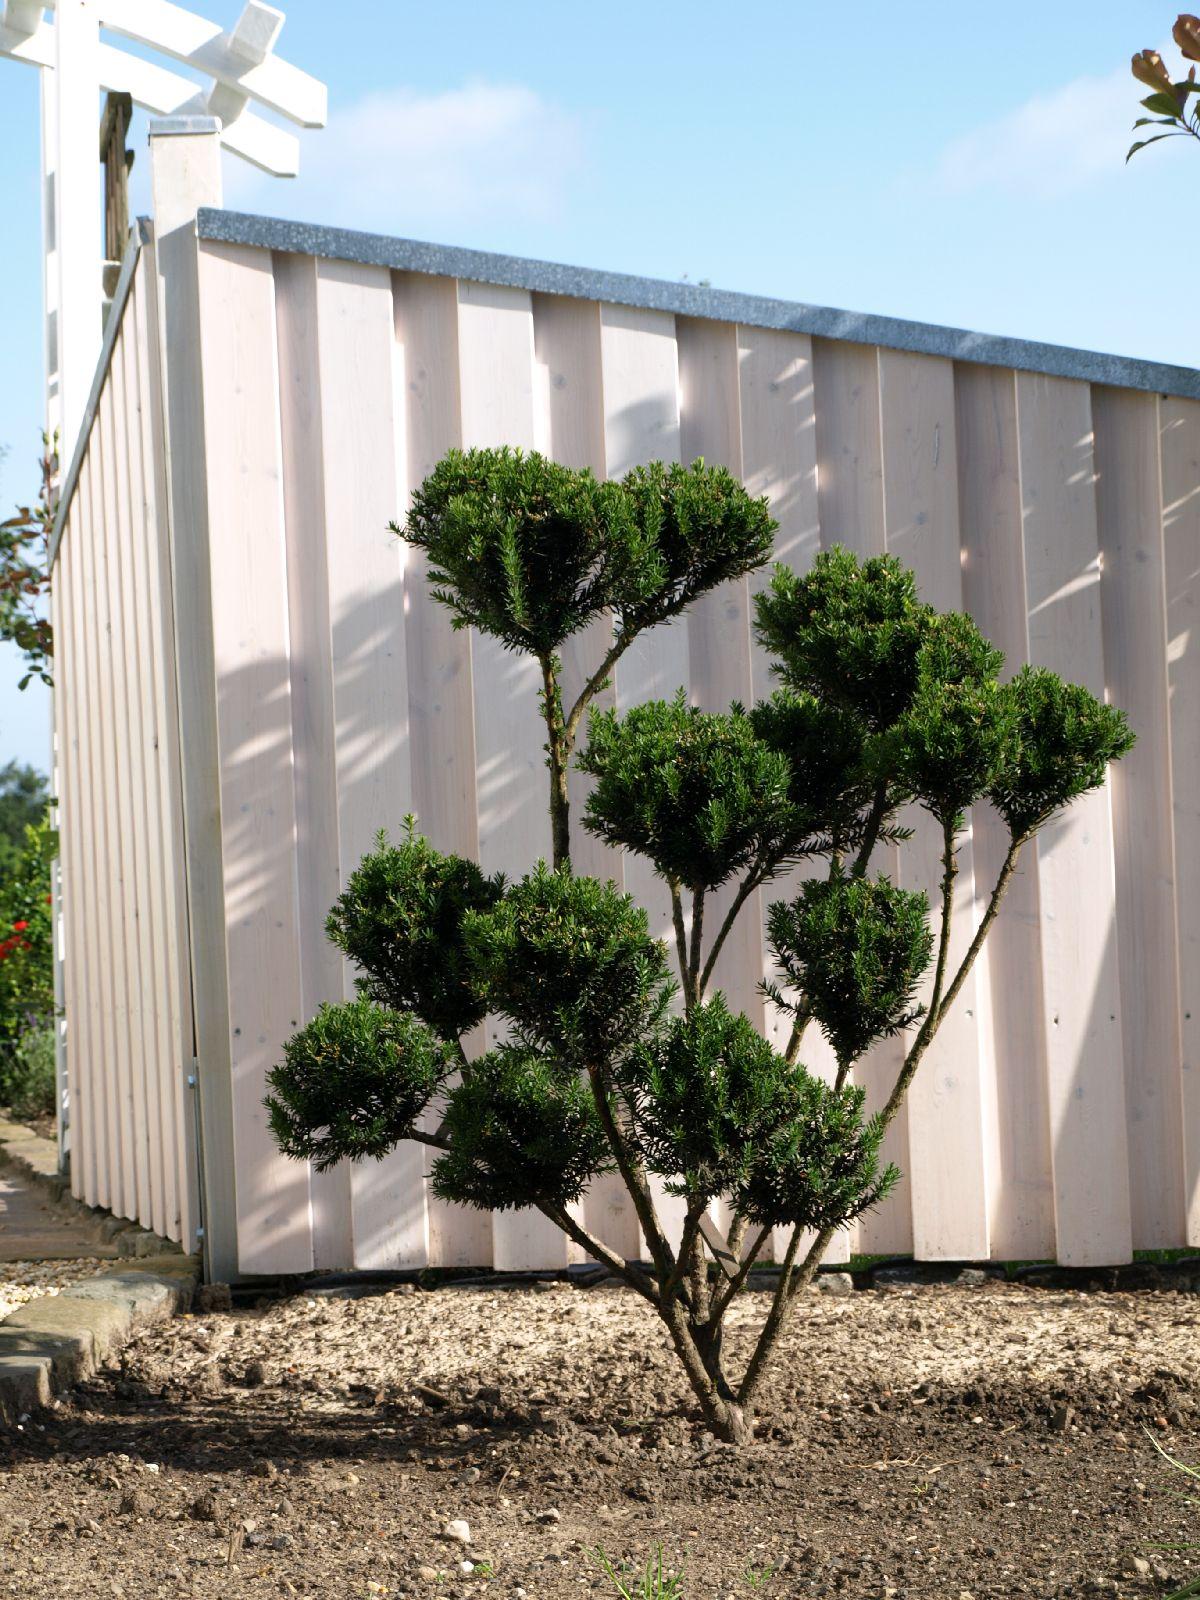 Plants-Trees_Photo_Texture_B_P6293856